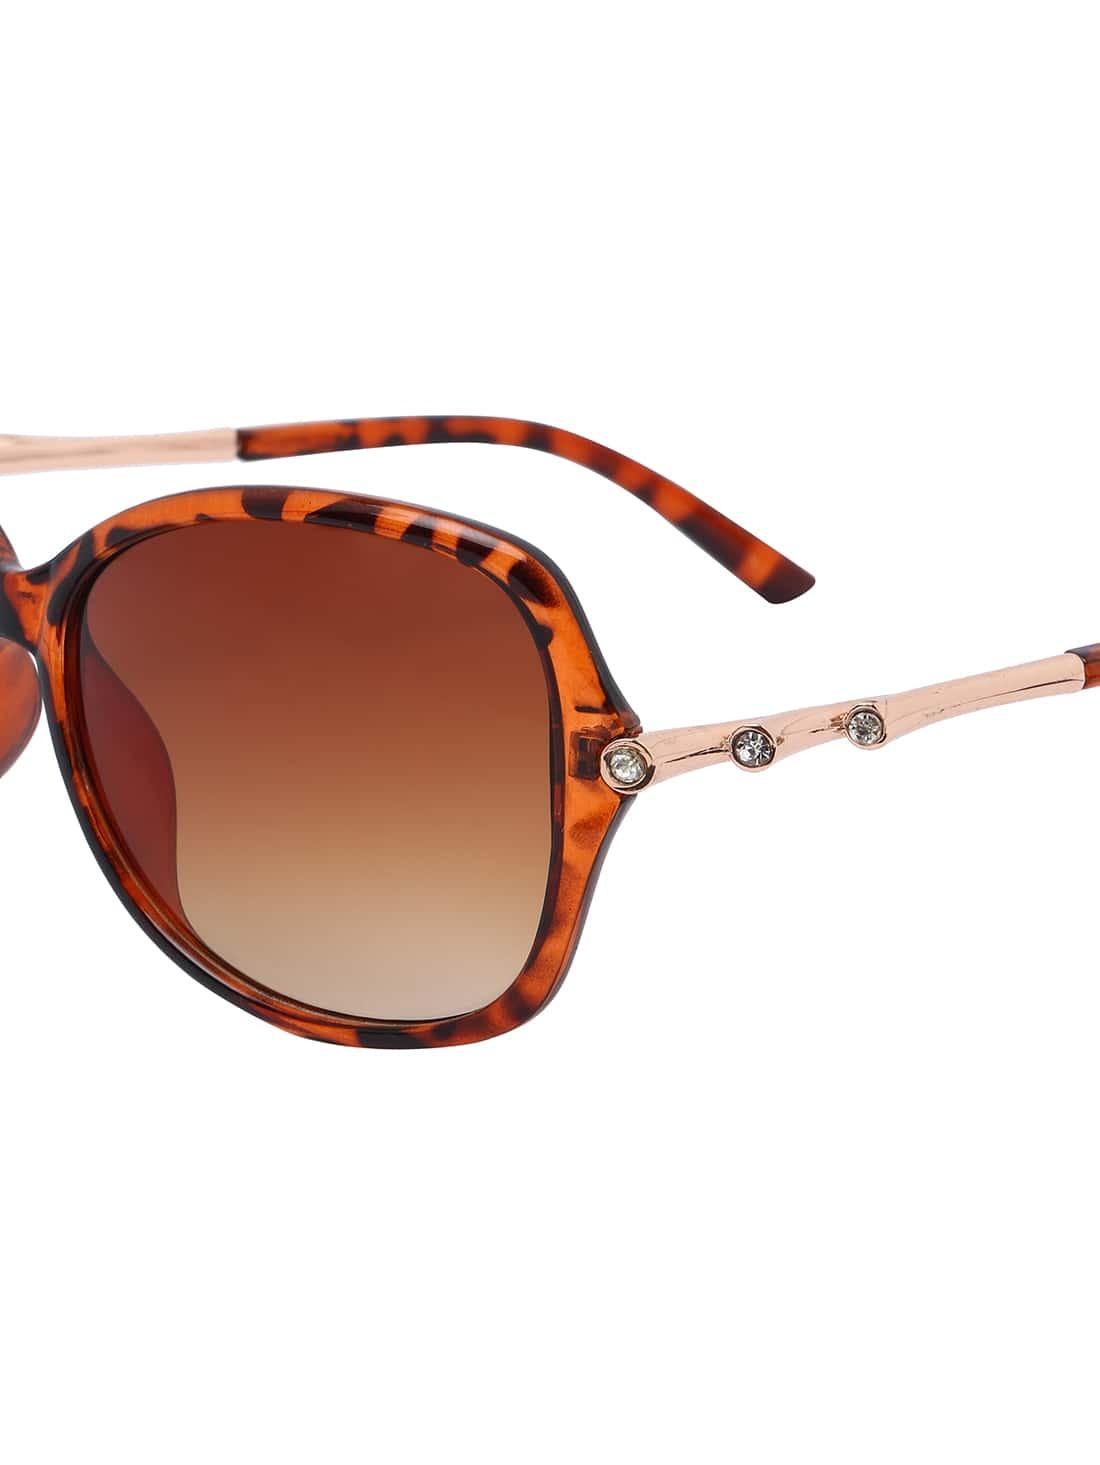 94a4dd2986 Oversized Rhinestone Sunglasses Wholesale